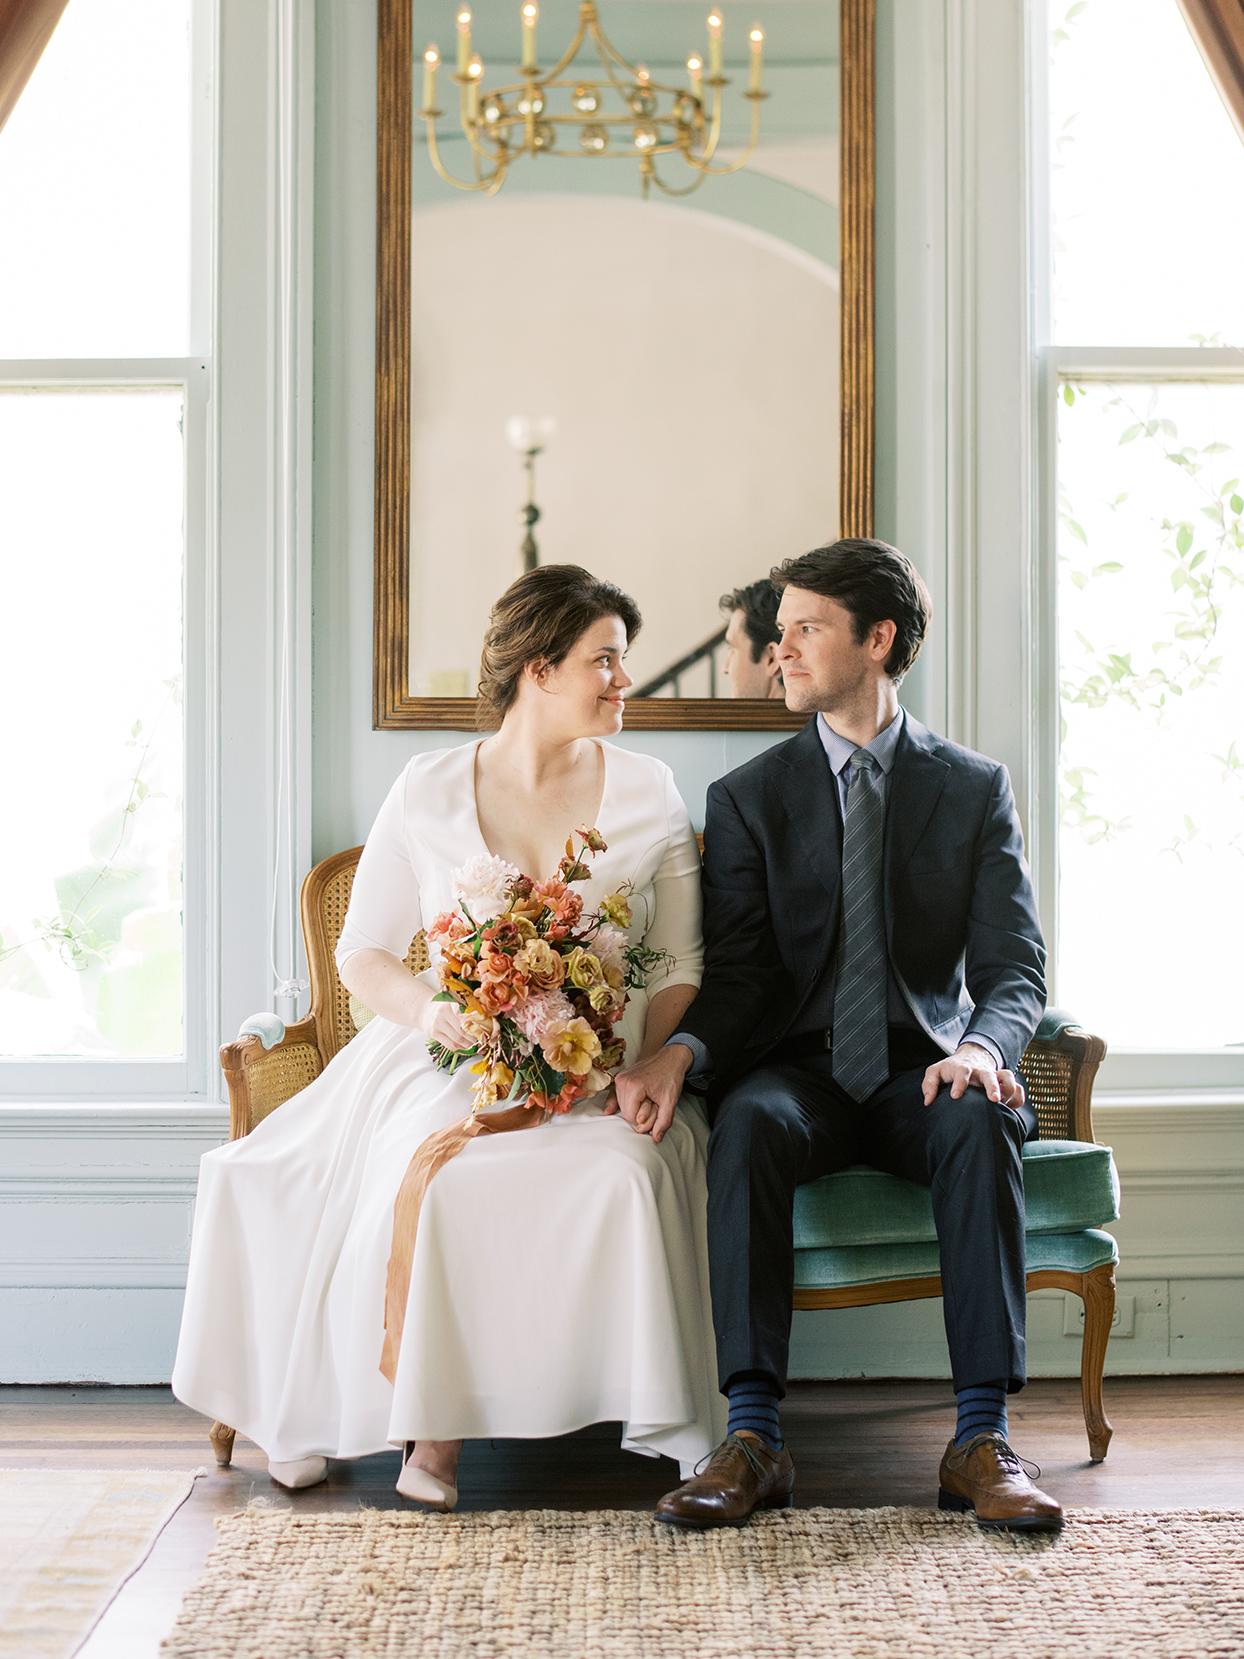 elizabeth scott wedding couple sitting in antique chairs by window